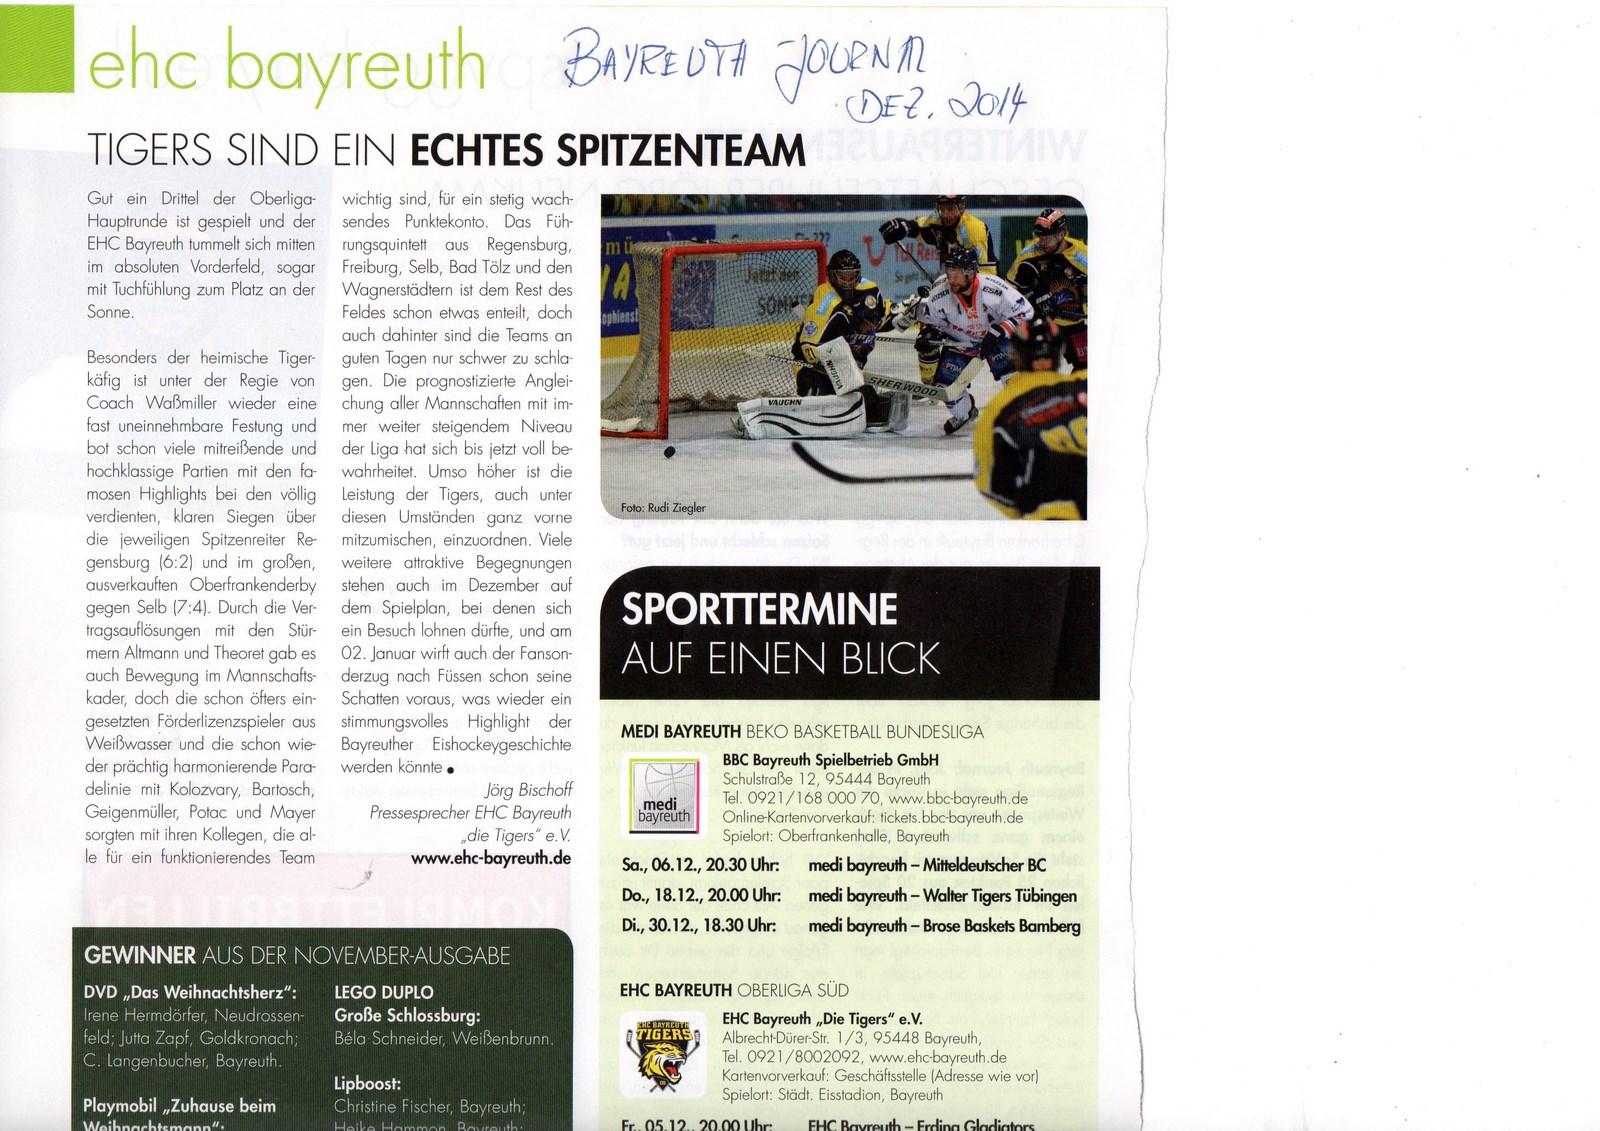 Bayreuth Journal 2014-12 [1600x1200]